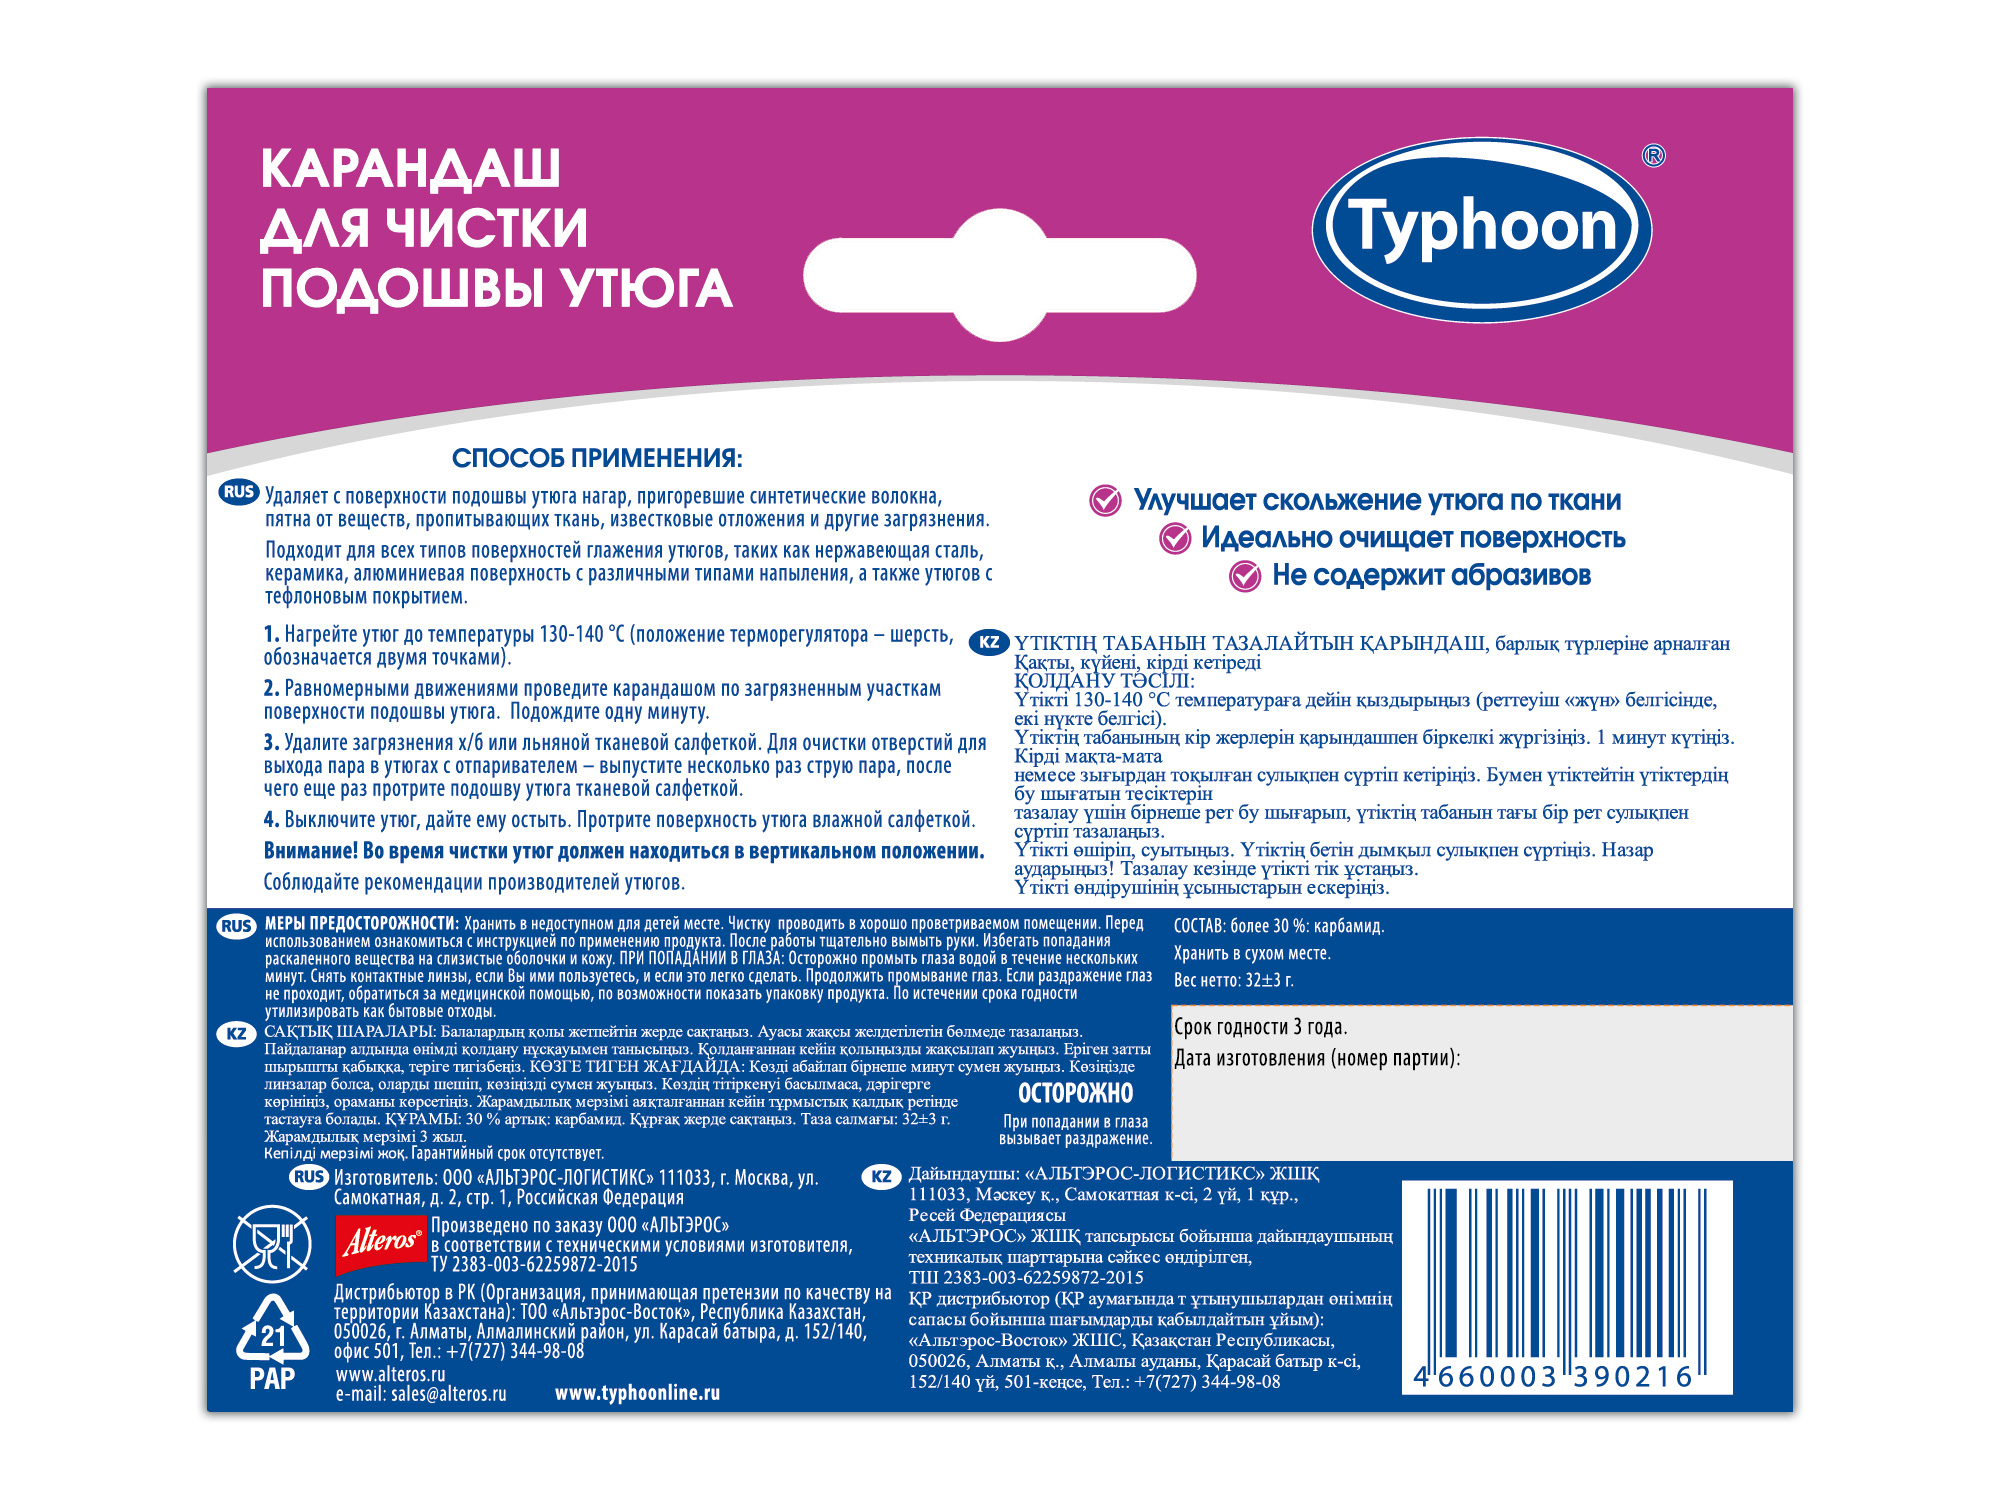 Карандаш для очистки утюга ТАЙФУН 390216